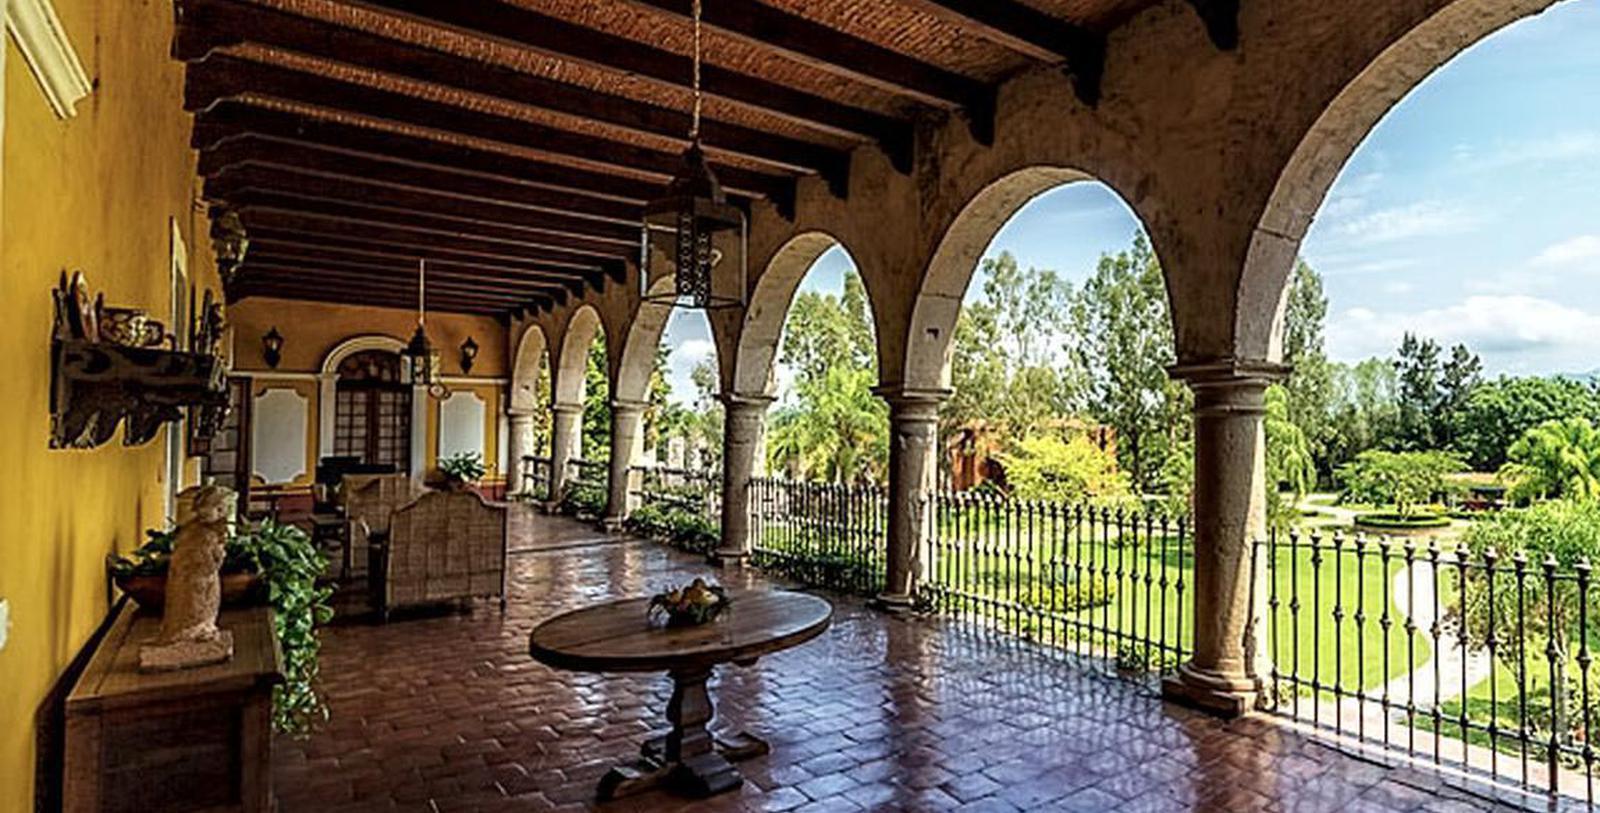 Image of Terrace & Courtyard, Hacienda el Carmen Hotel & Spa, Ahualulco de Mercado, 1722, Member of Historic Hotels Worldwide, Experience